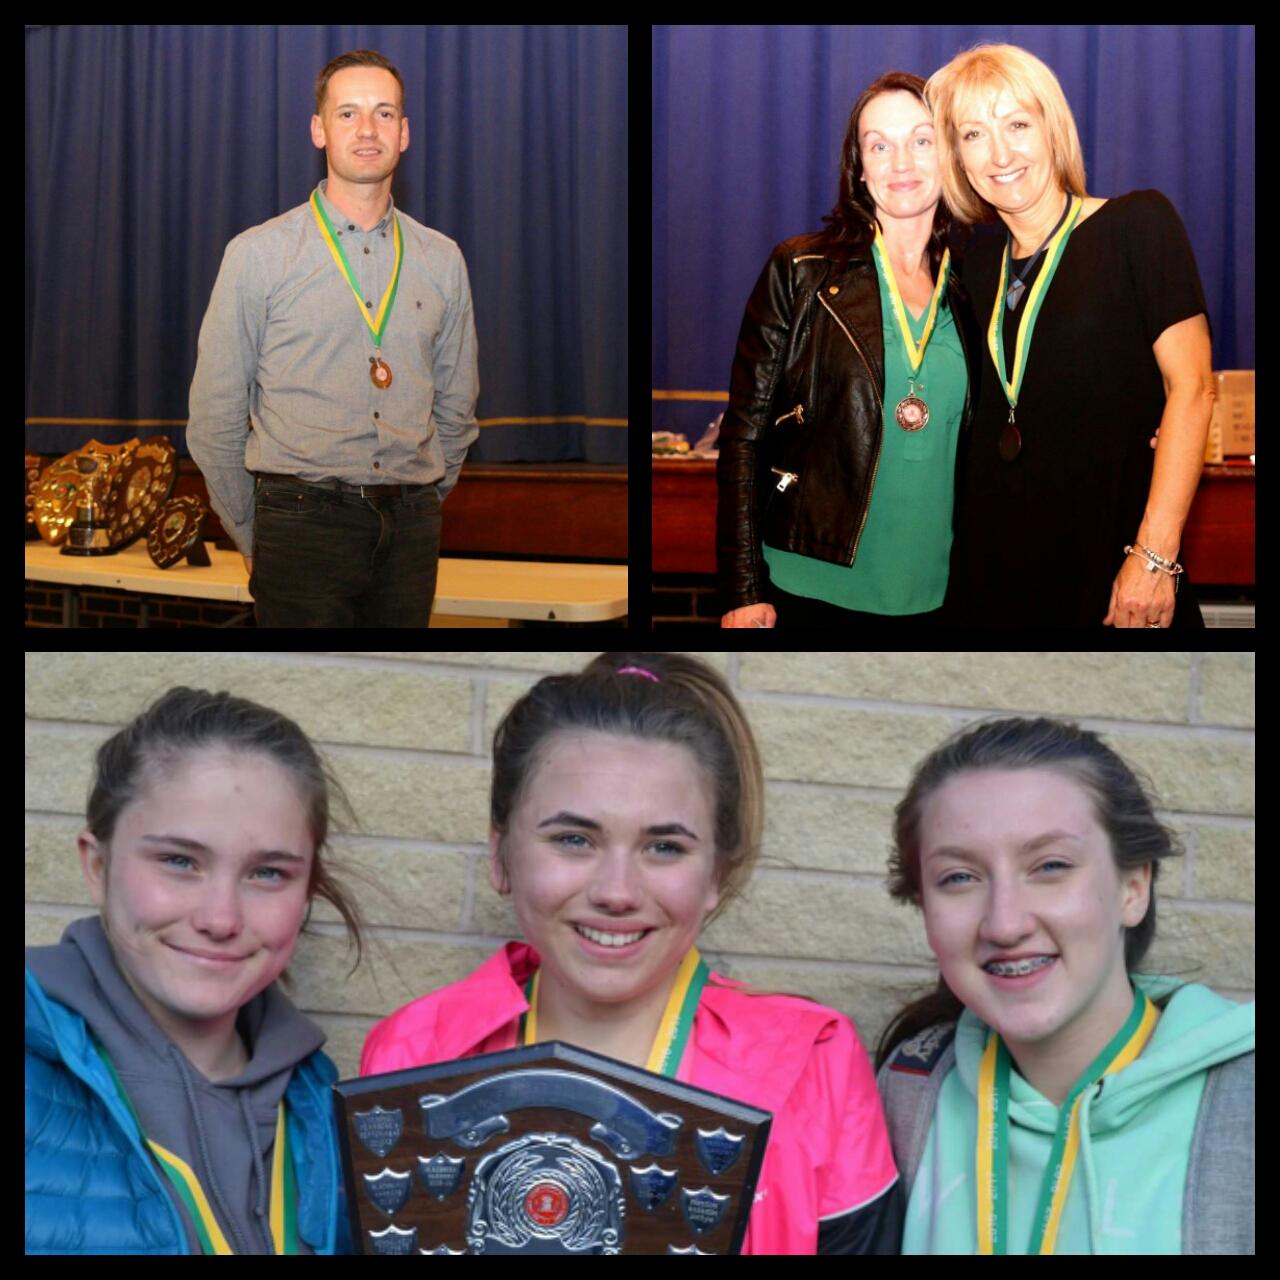 Top Row: Mick Hughes, Michelle Abbott, Irene Roche Bottom Row: U15 Girls - Natasha Olszewska, Millie Stubbs and Briony Holt